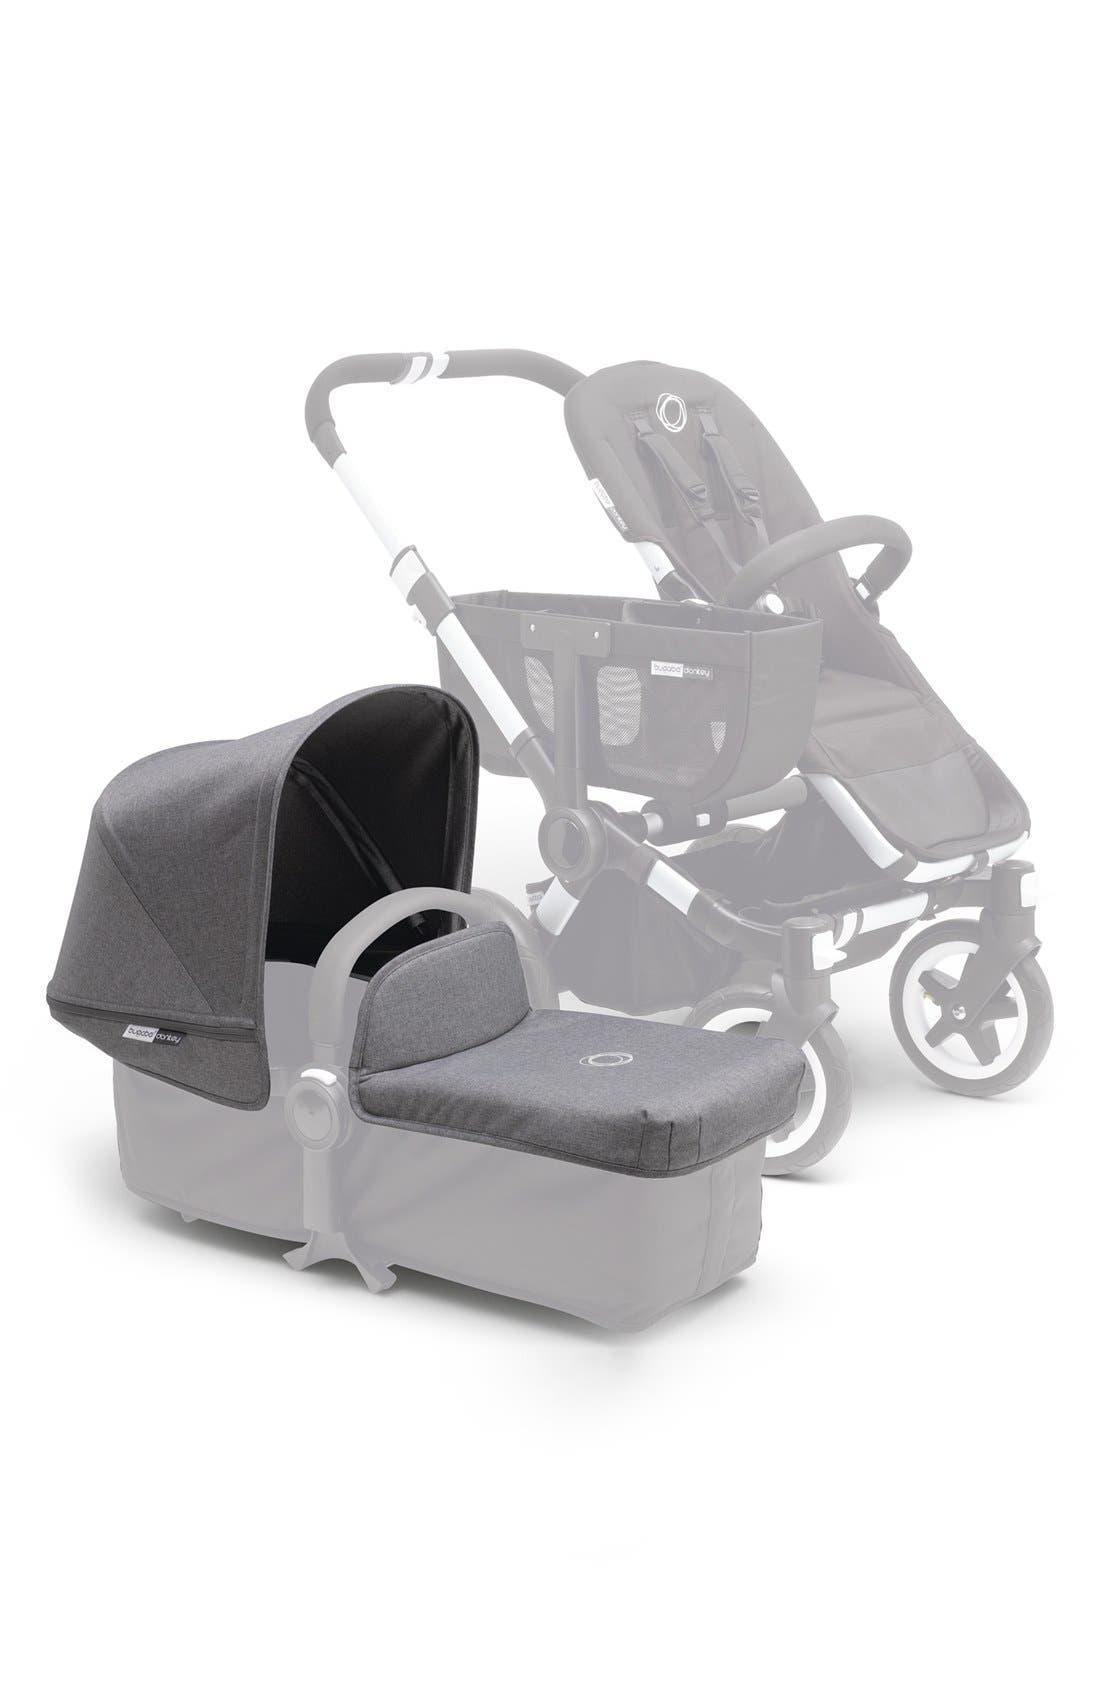 Main Image - Bugaboo 'Donkey' Stroller Tailored Fabric Set